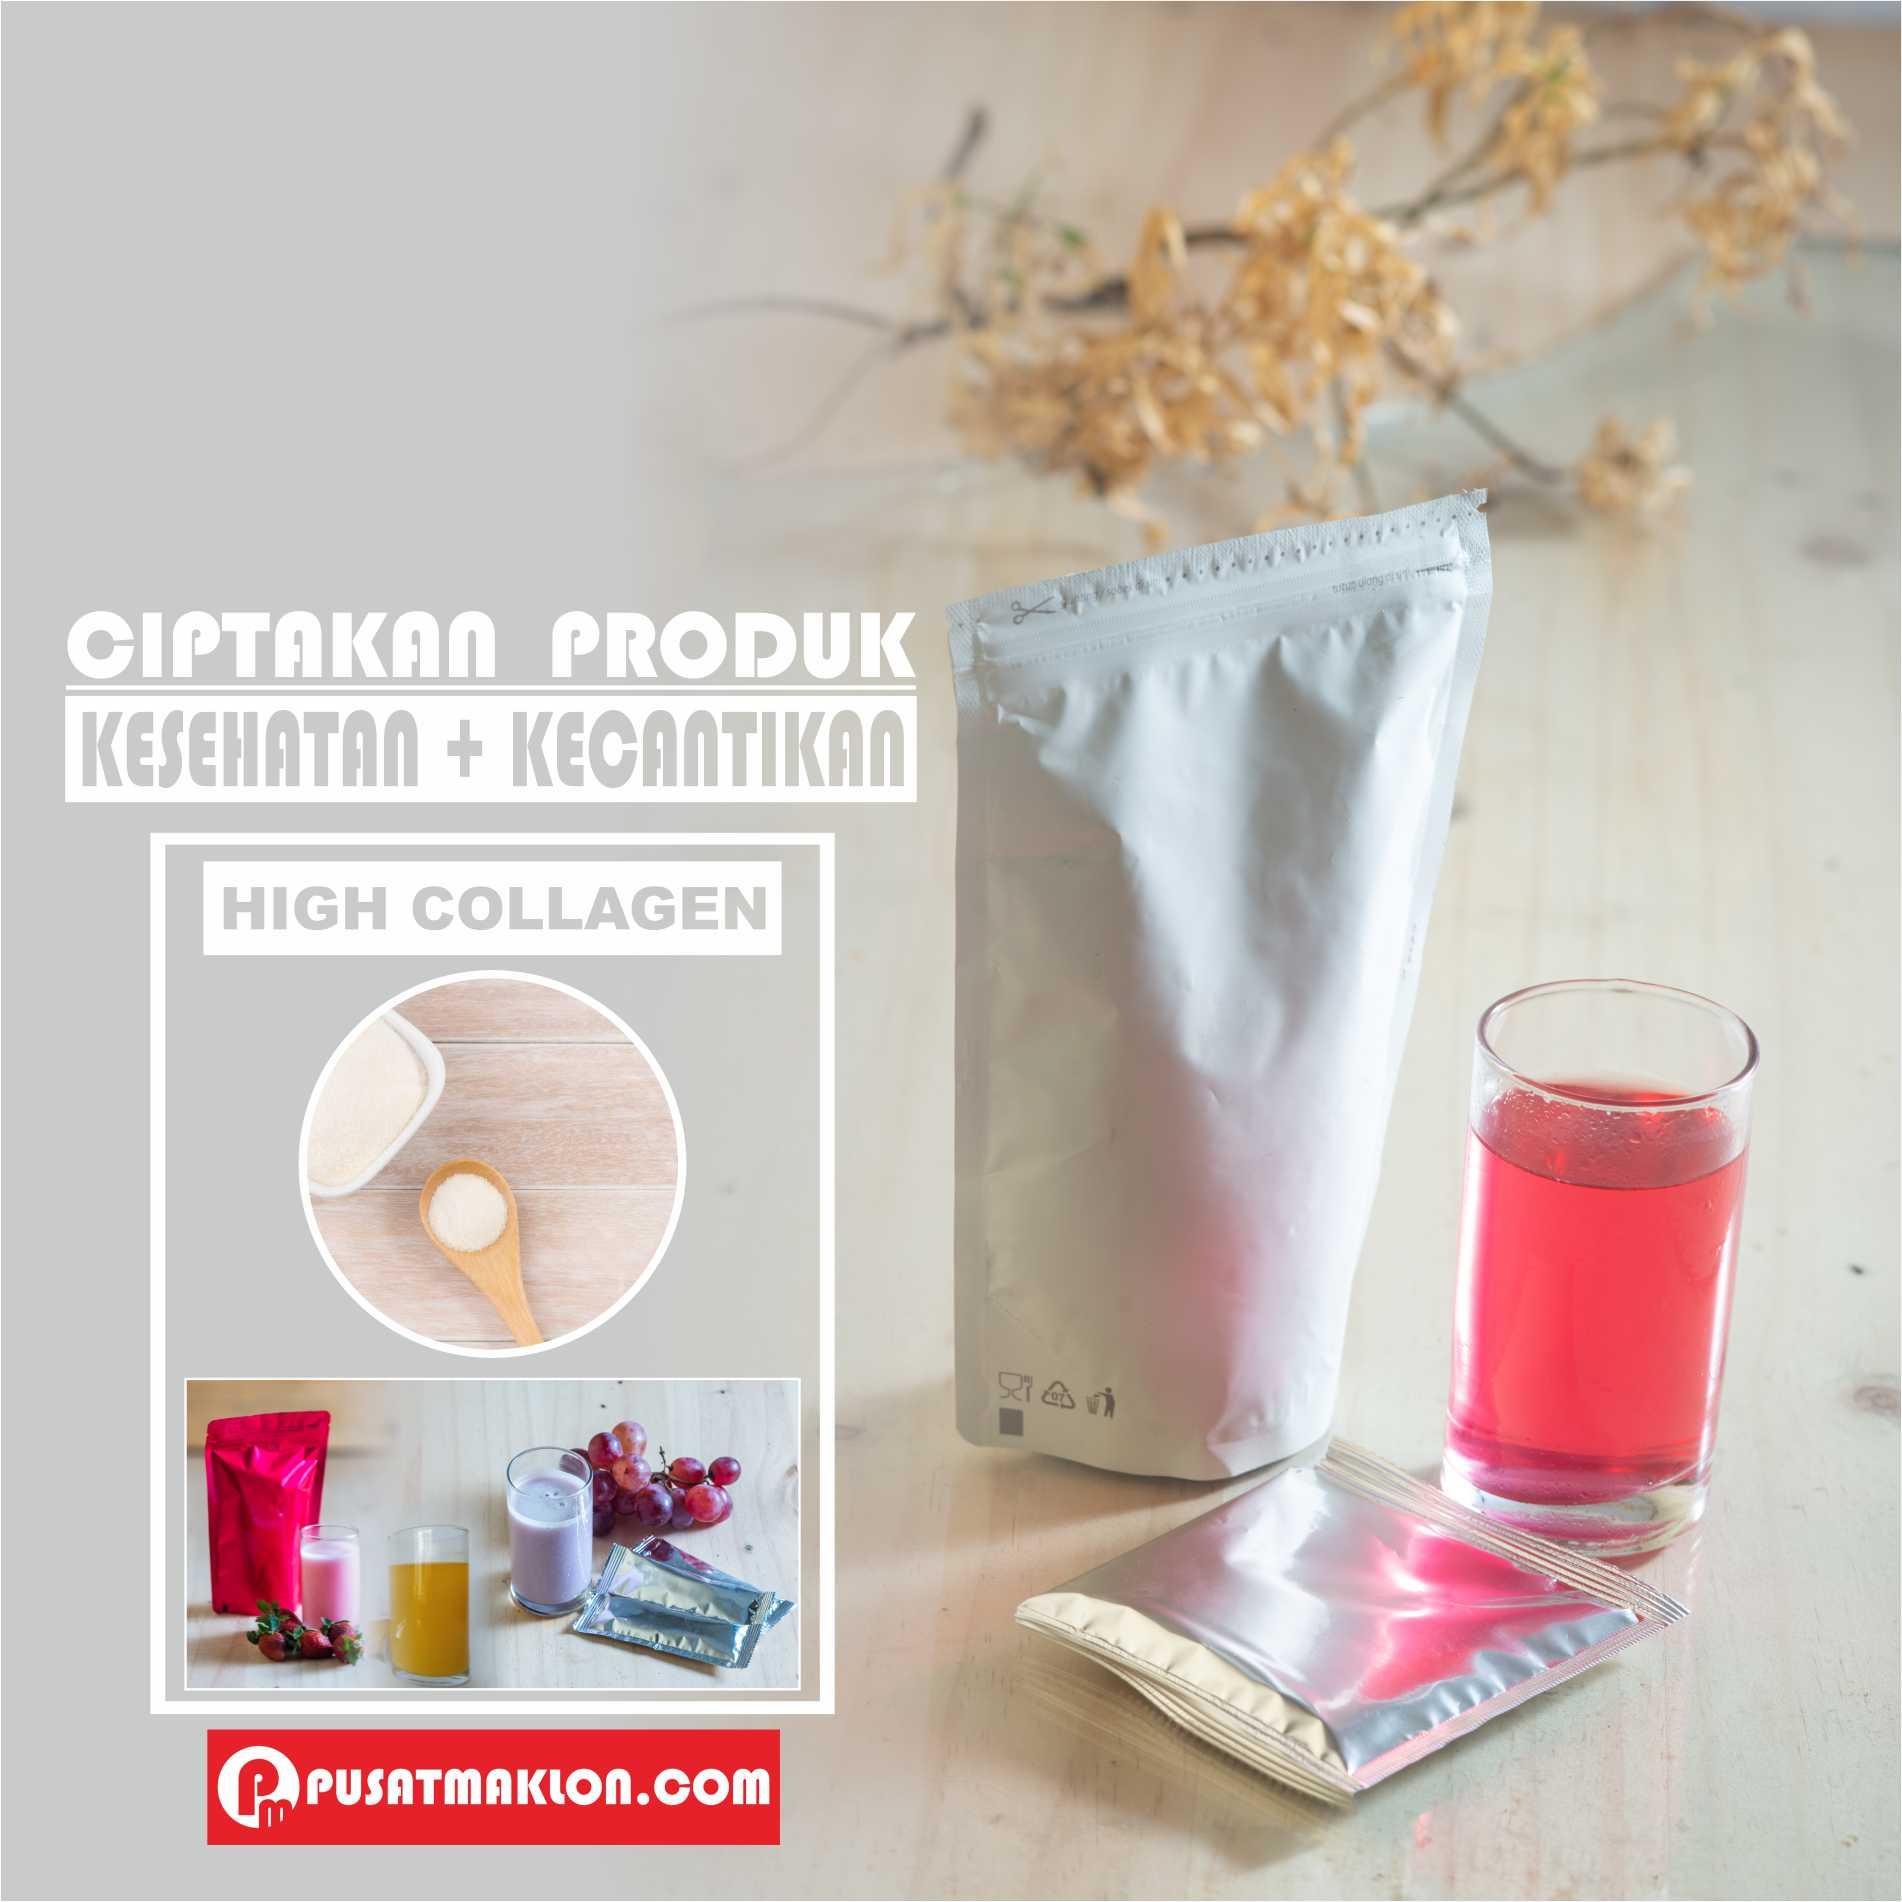 Maklon Produk collagen